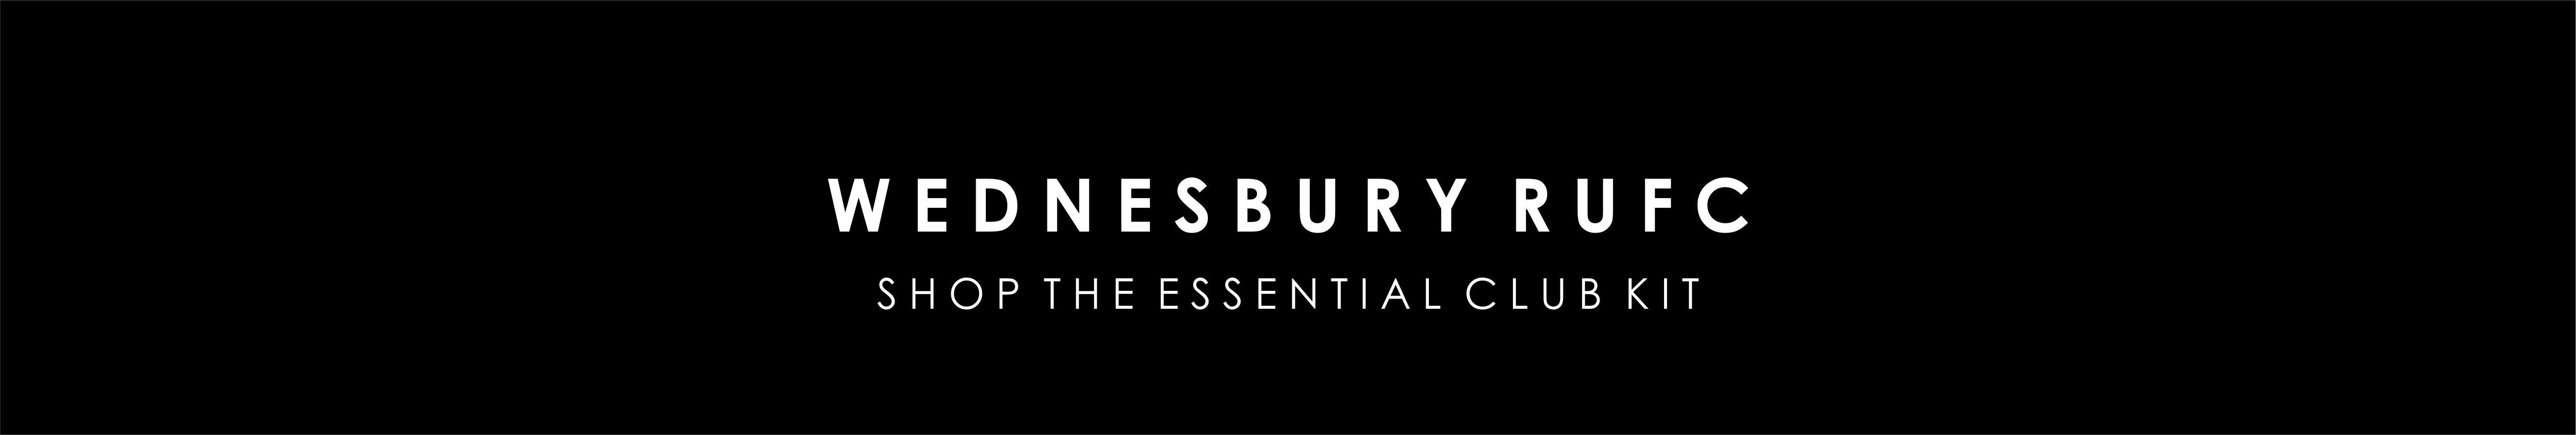 wednesbury-rufc-banner.jpg